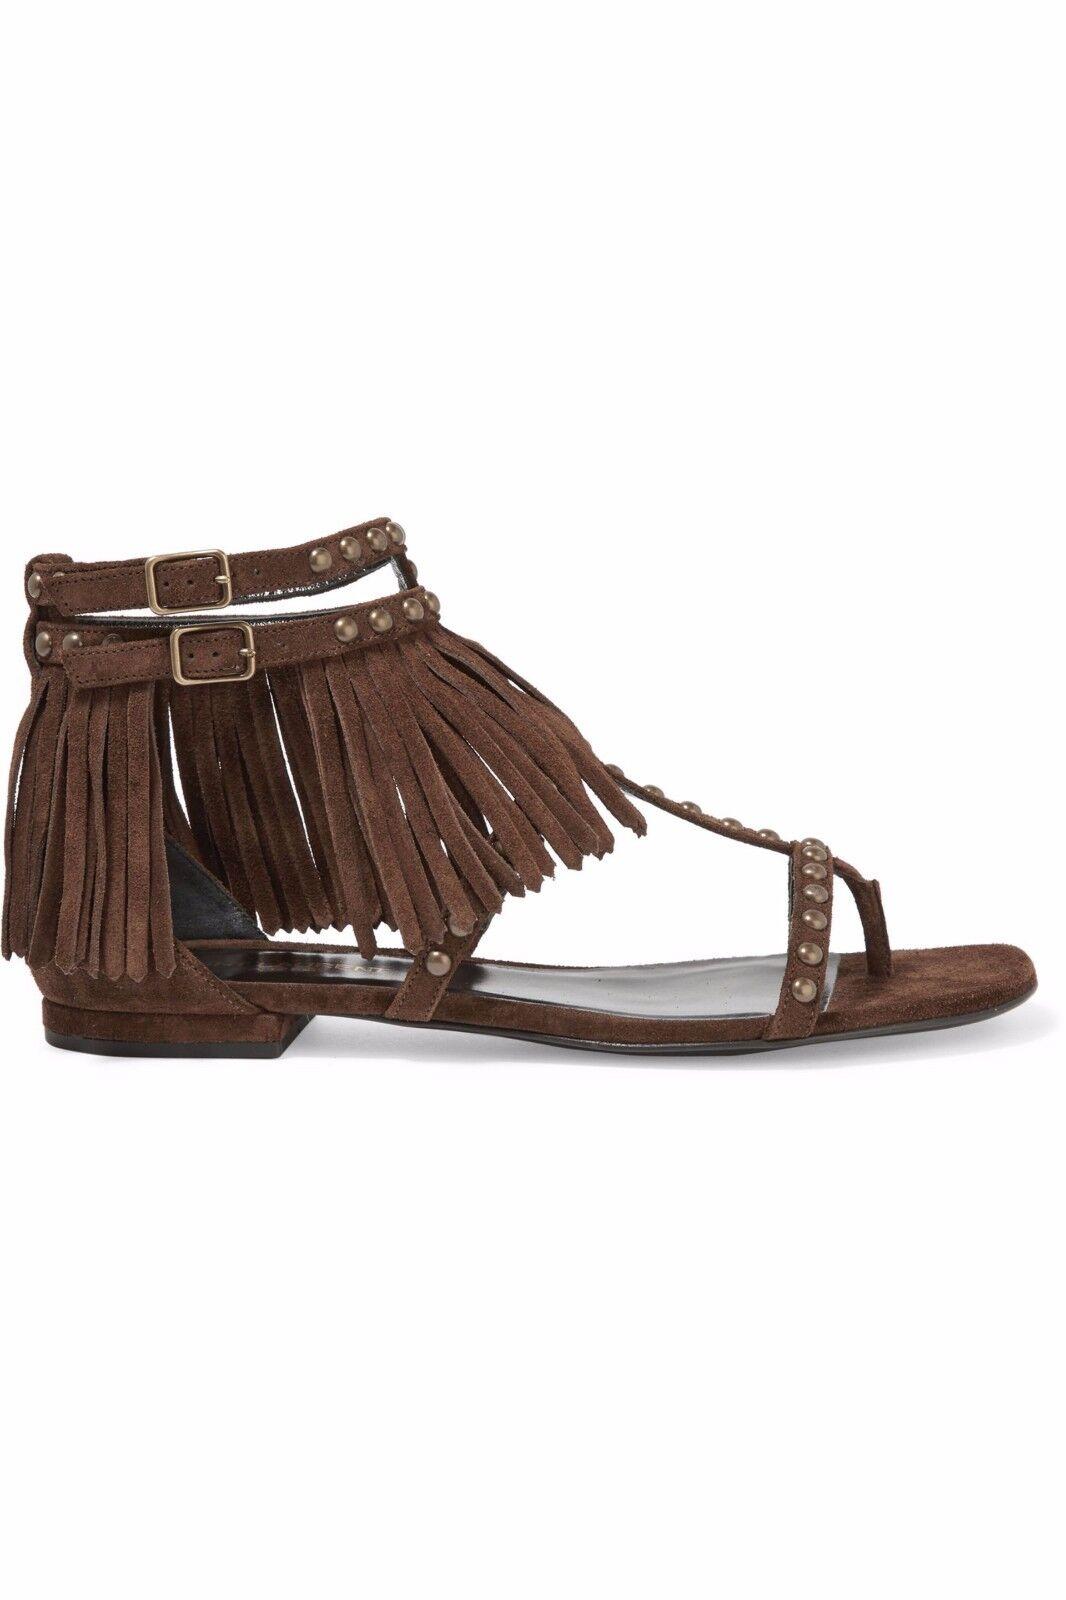 Ysl saint laurent Gladiator sandalias de cuero marrón nuevo embalaje original